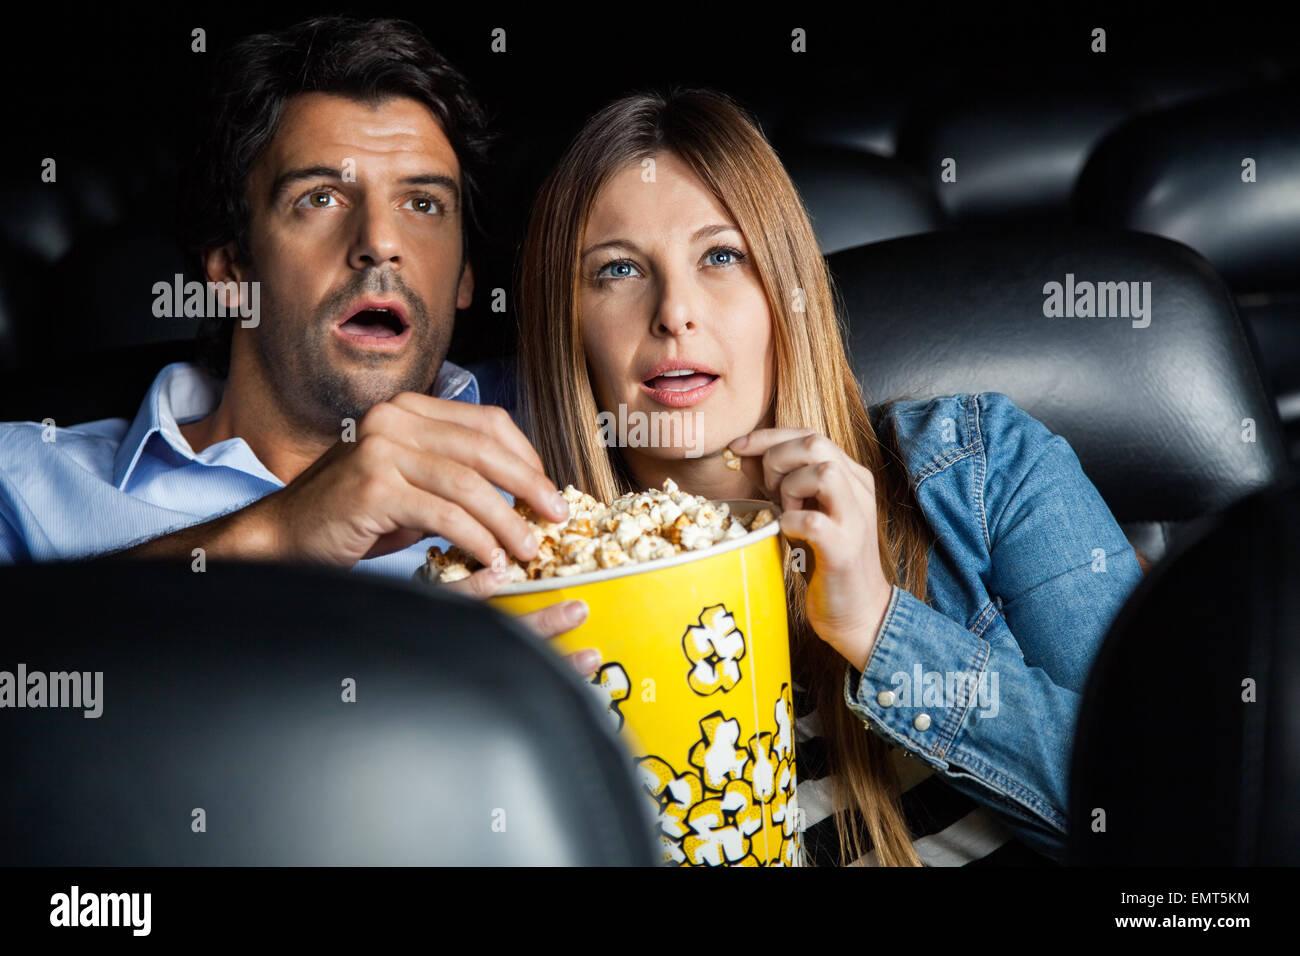 Schockiert paar Film im Theater Stockbild